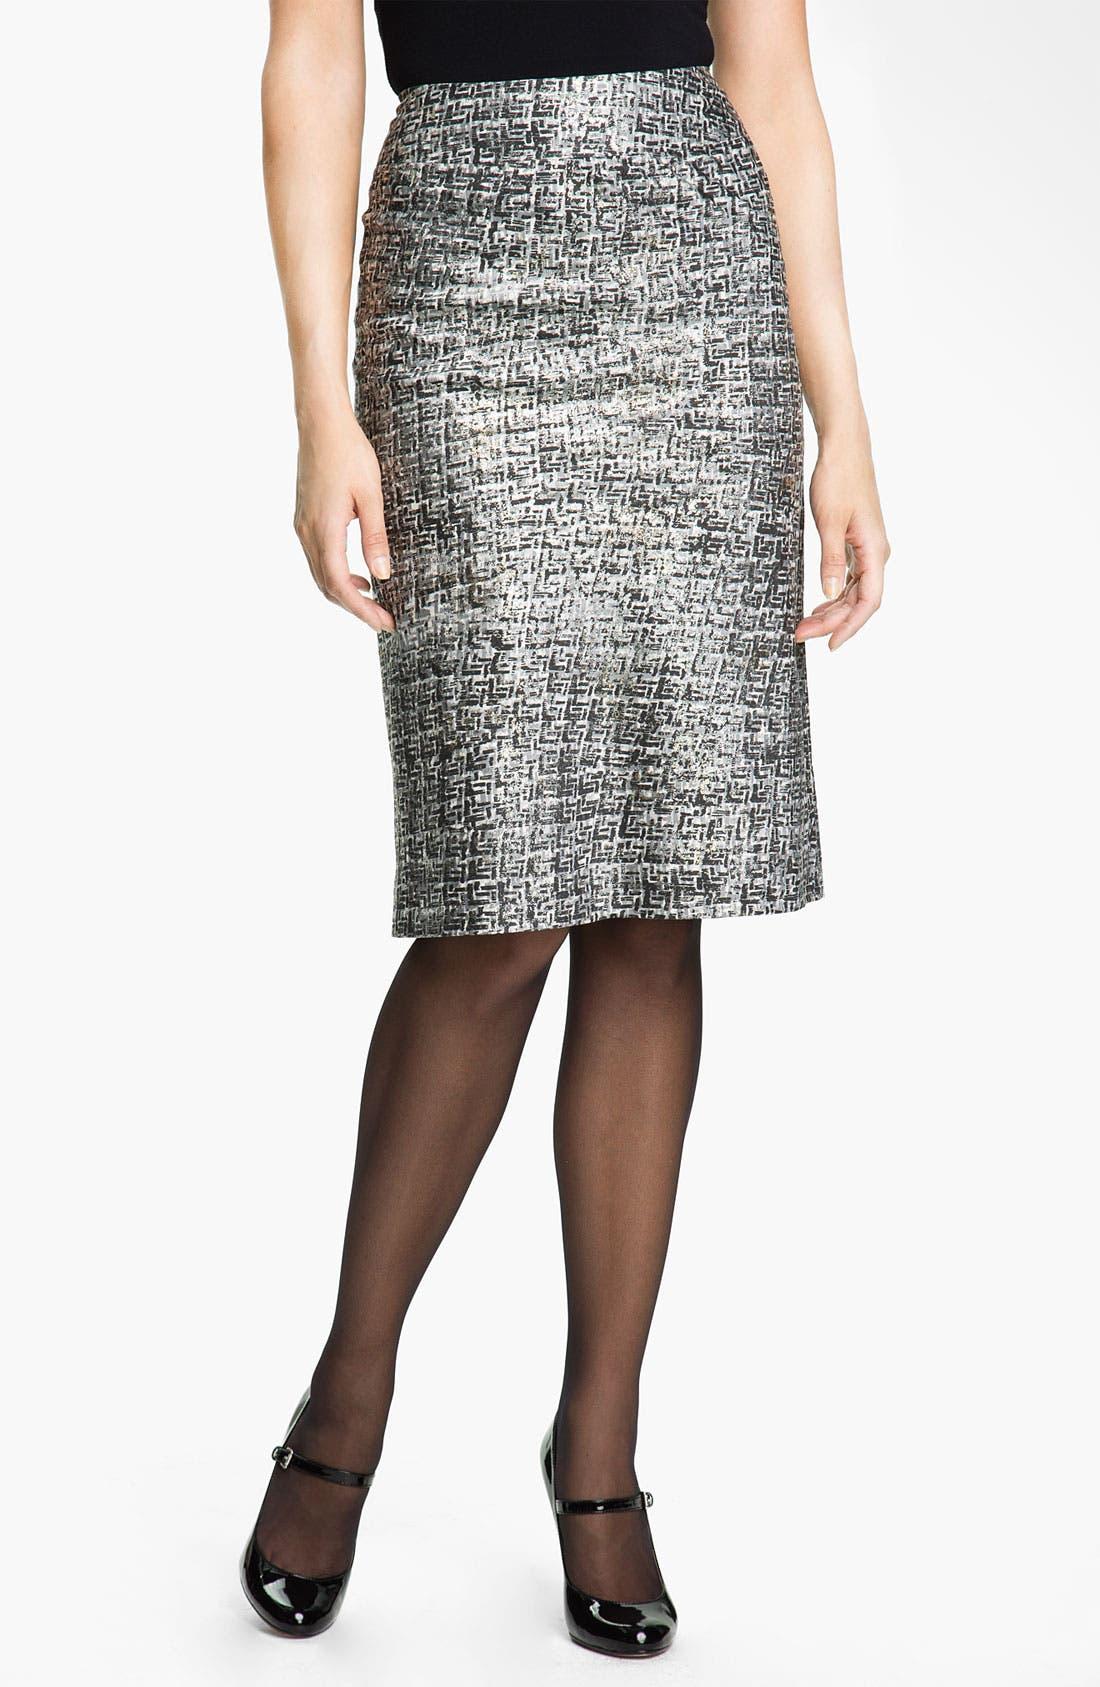 Alternate Image 1 Selected - Nic + Zoe Glitter Print Pencil Skirt